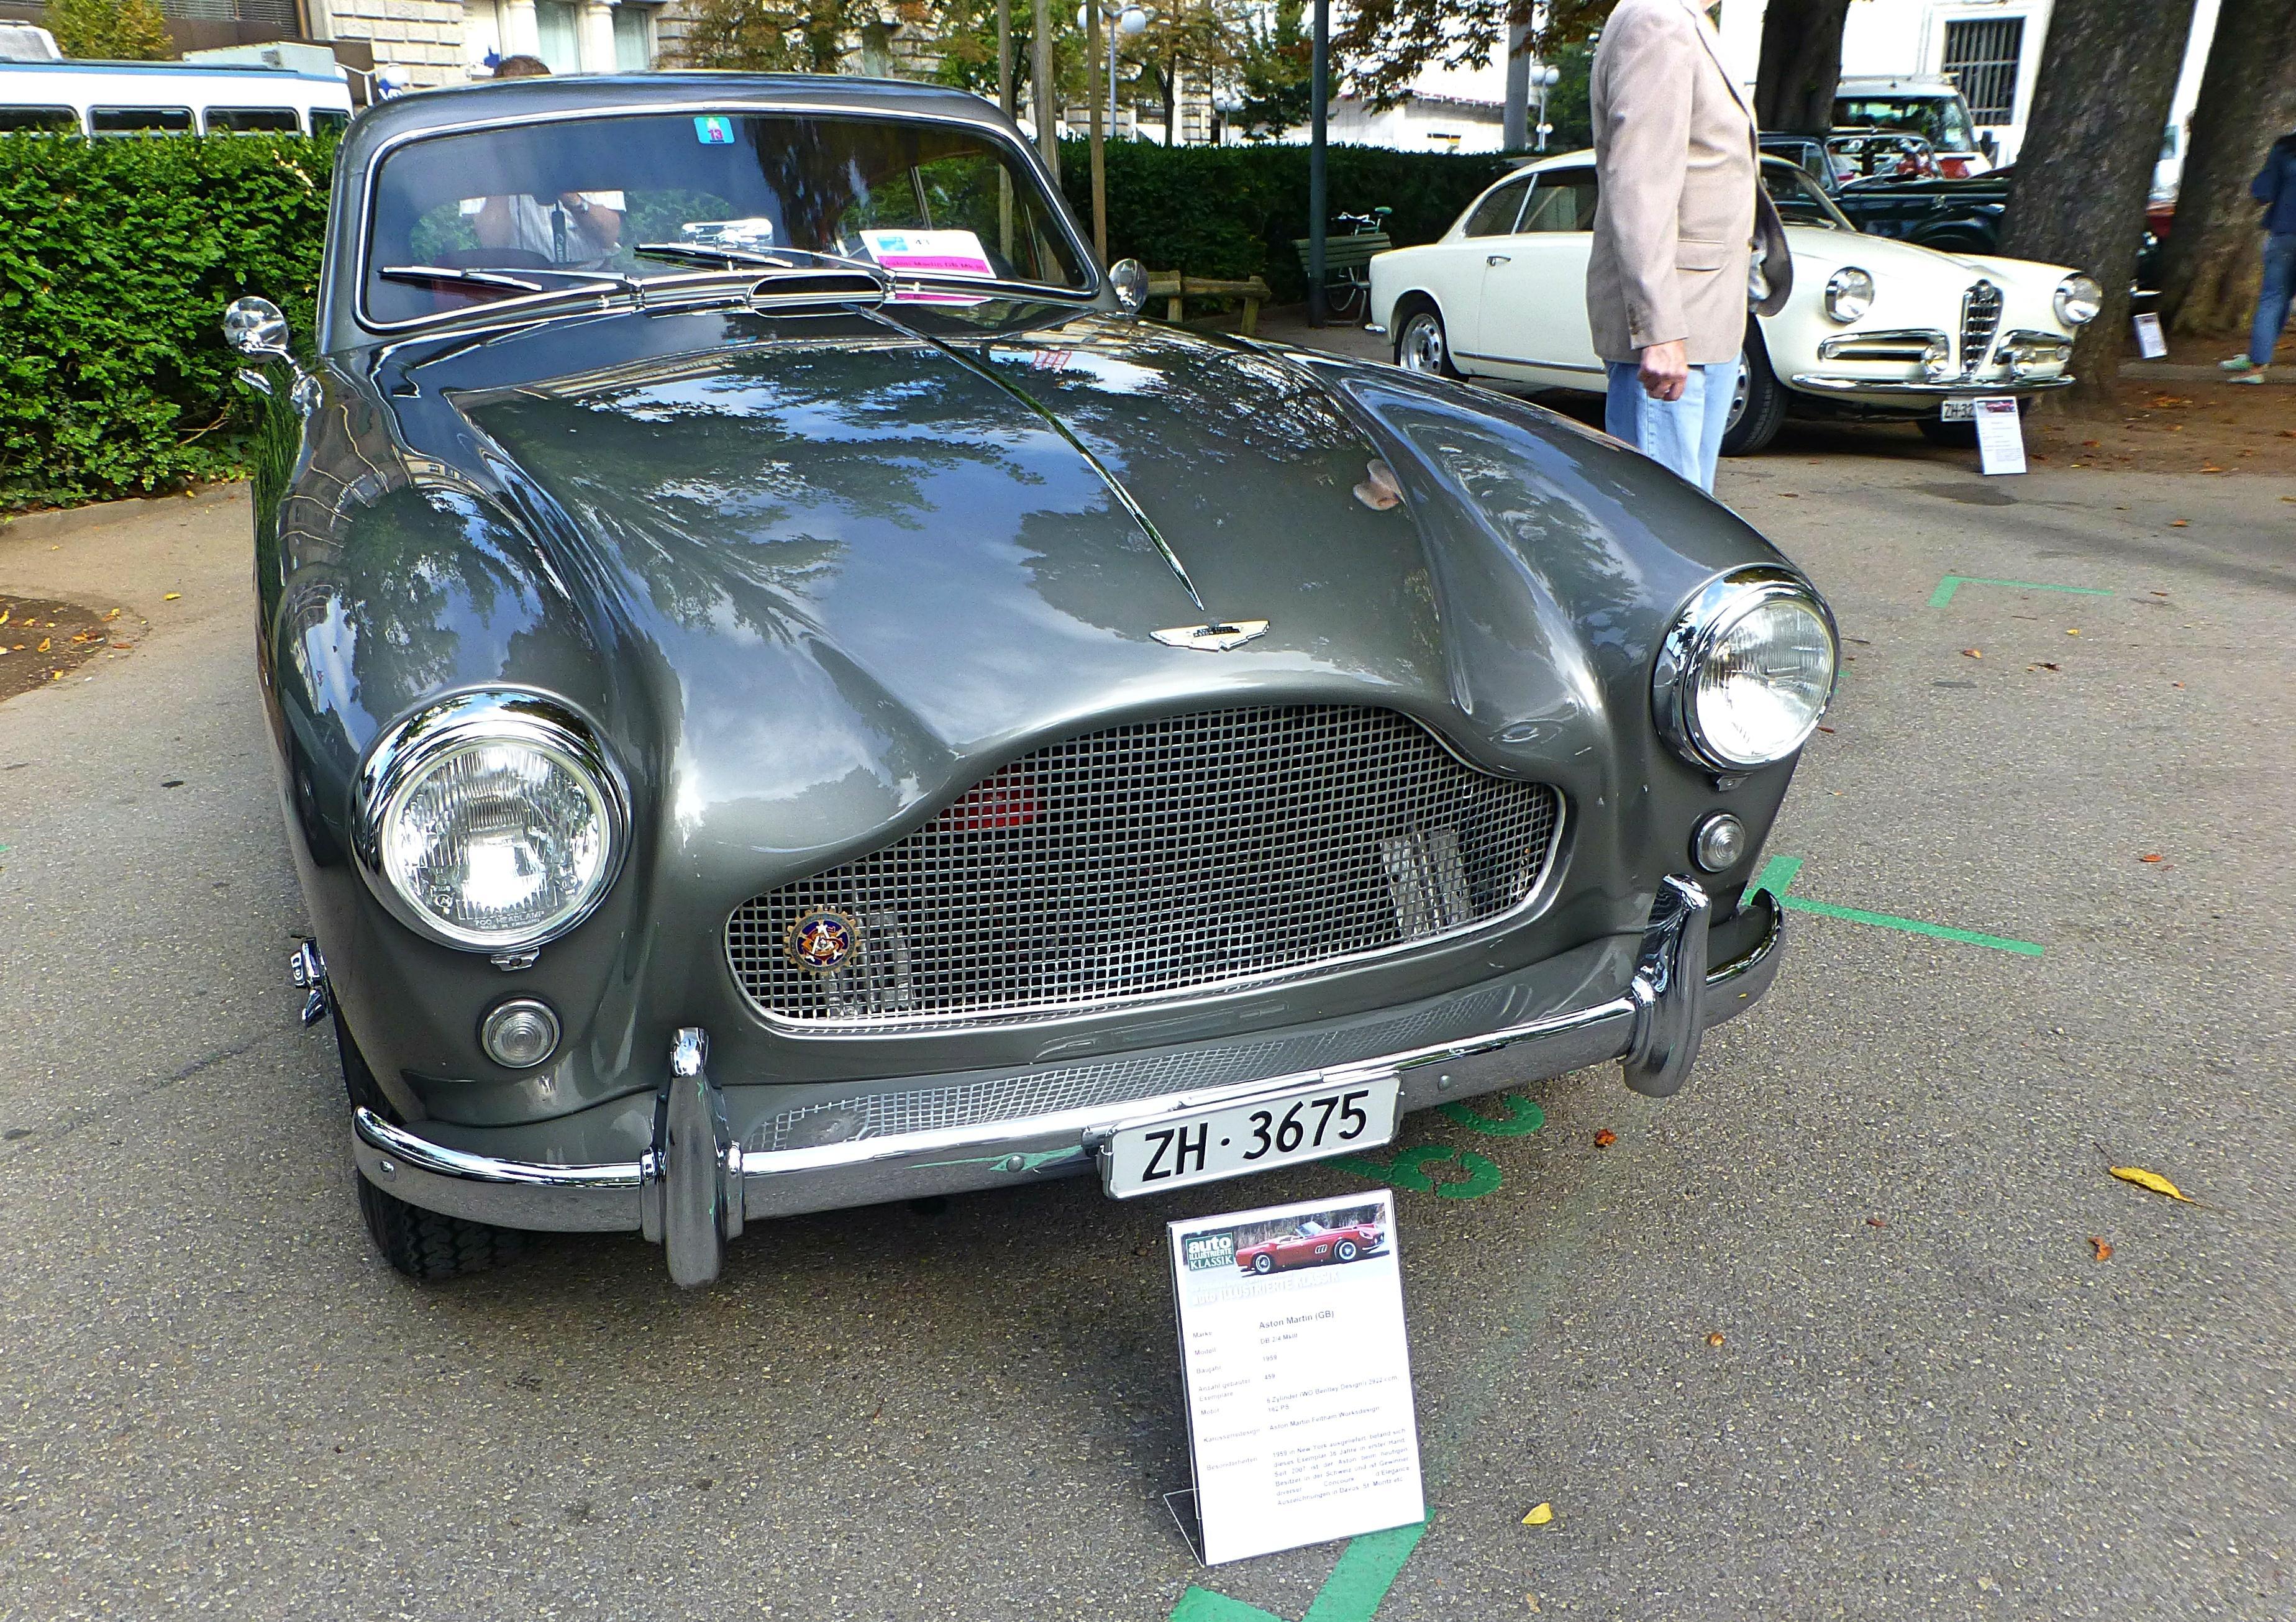 Zurich Classic Car Award 2013 (9)